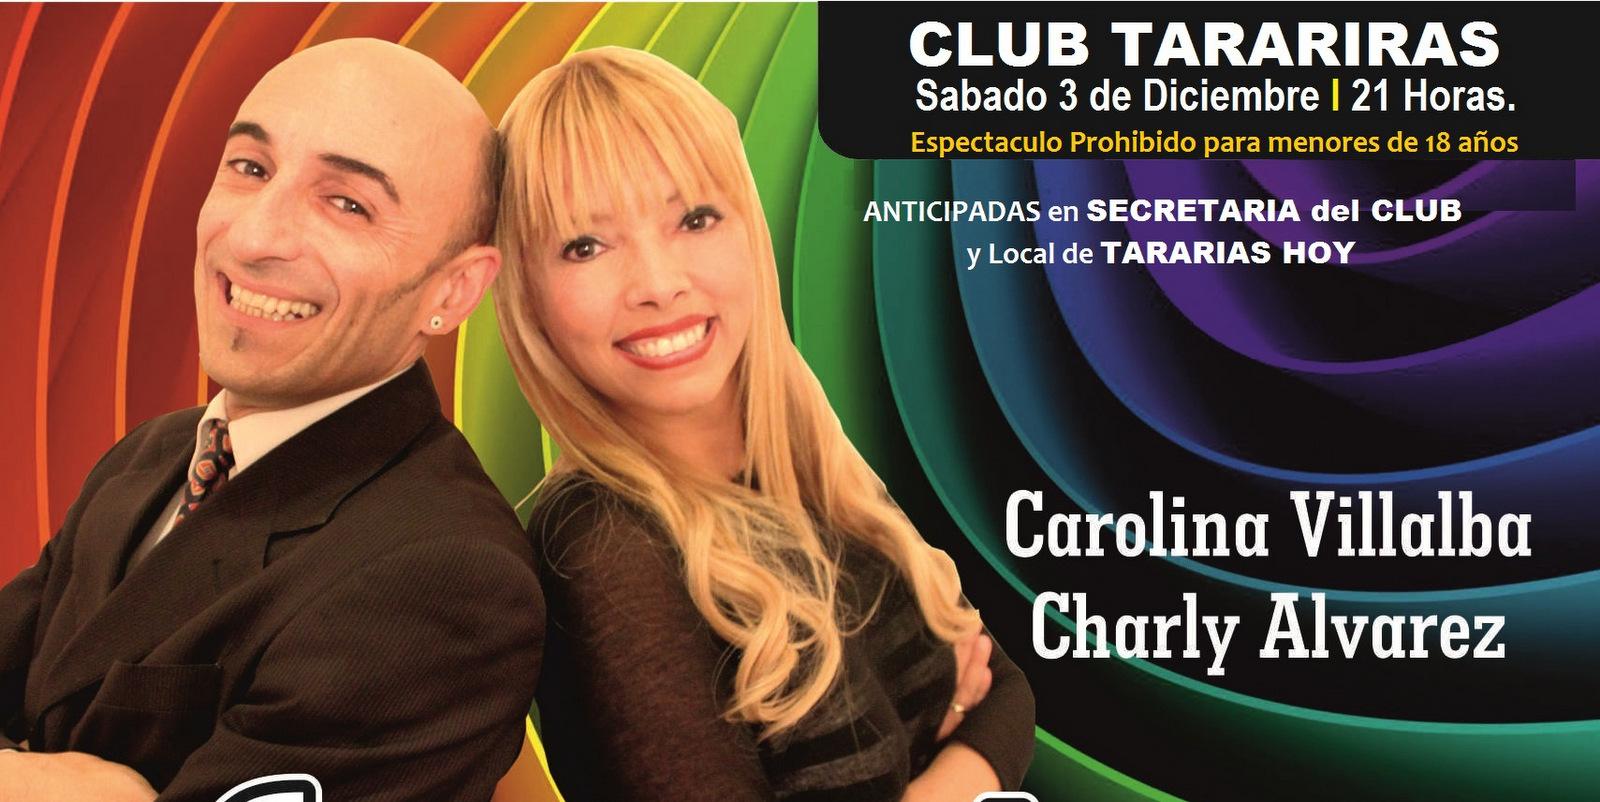 Carolina Villalba y Charly Álvarez en Tarariras!